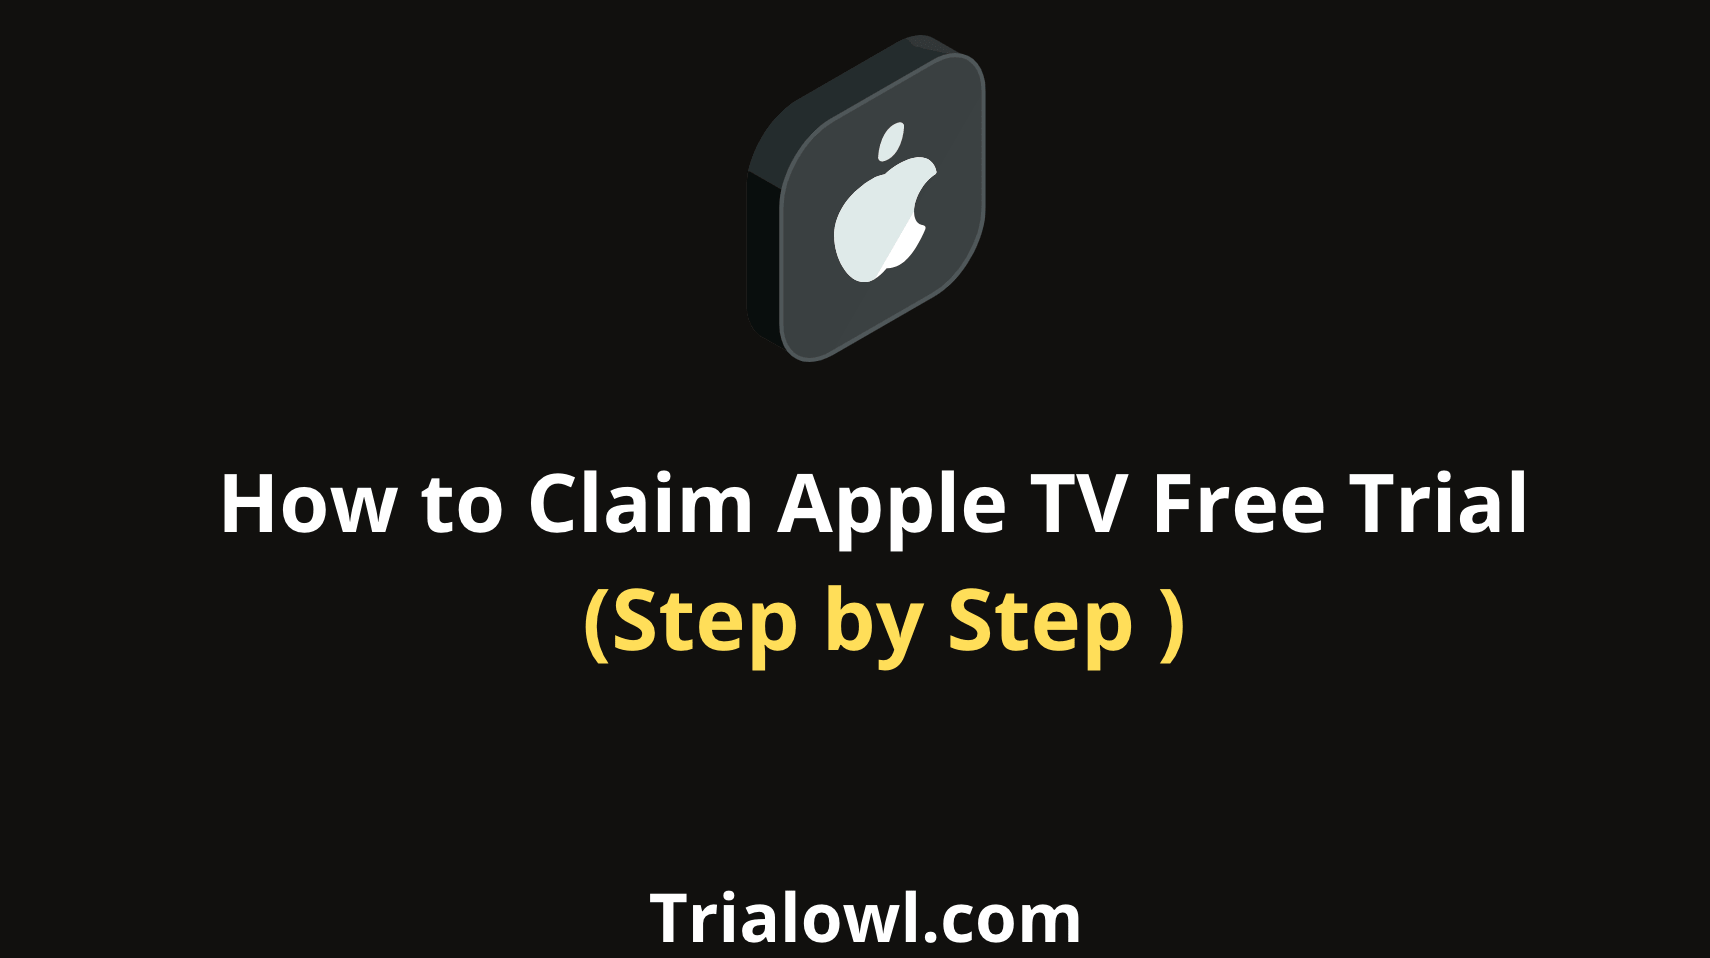 Claim Apple TV Free Trial